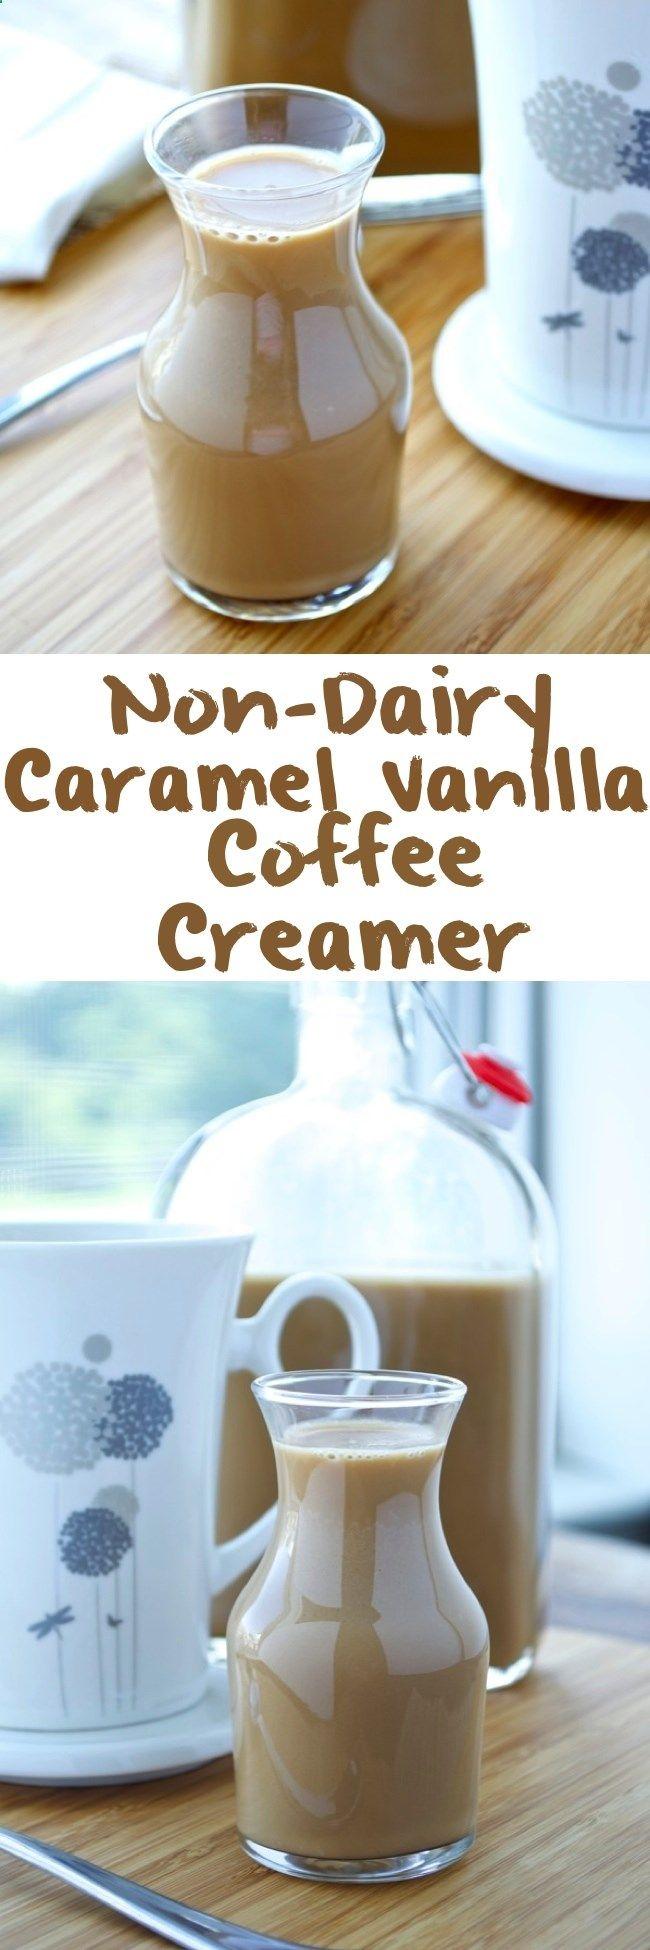 Caramel Vanilla Coffee Creamer dairyfree vegan gluten